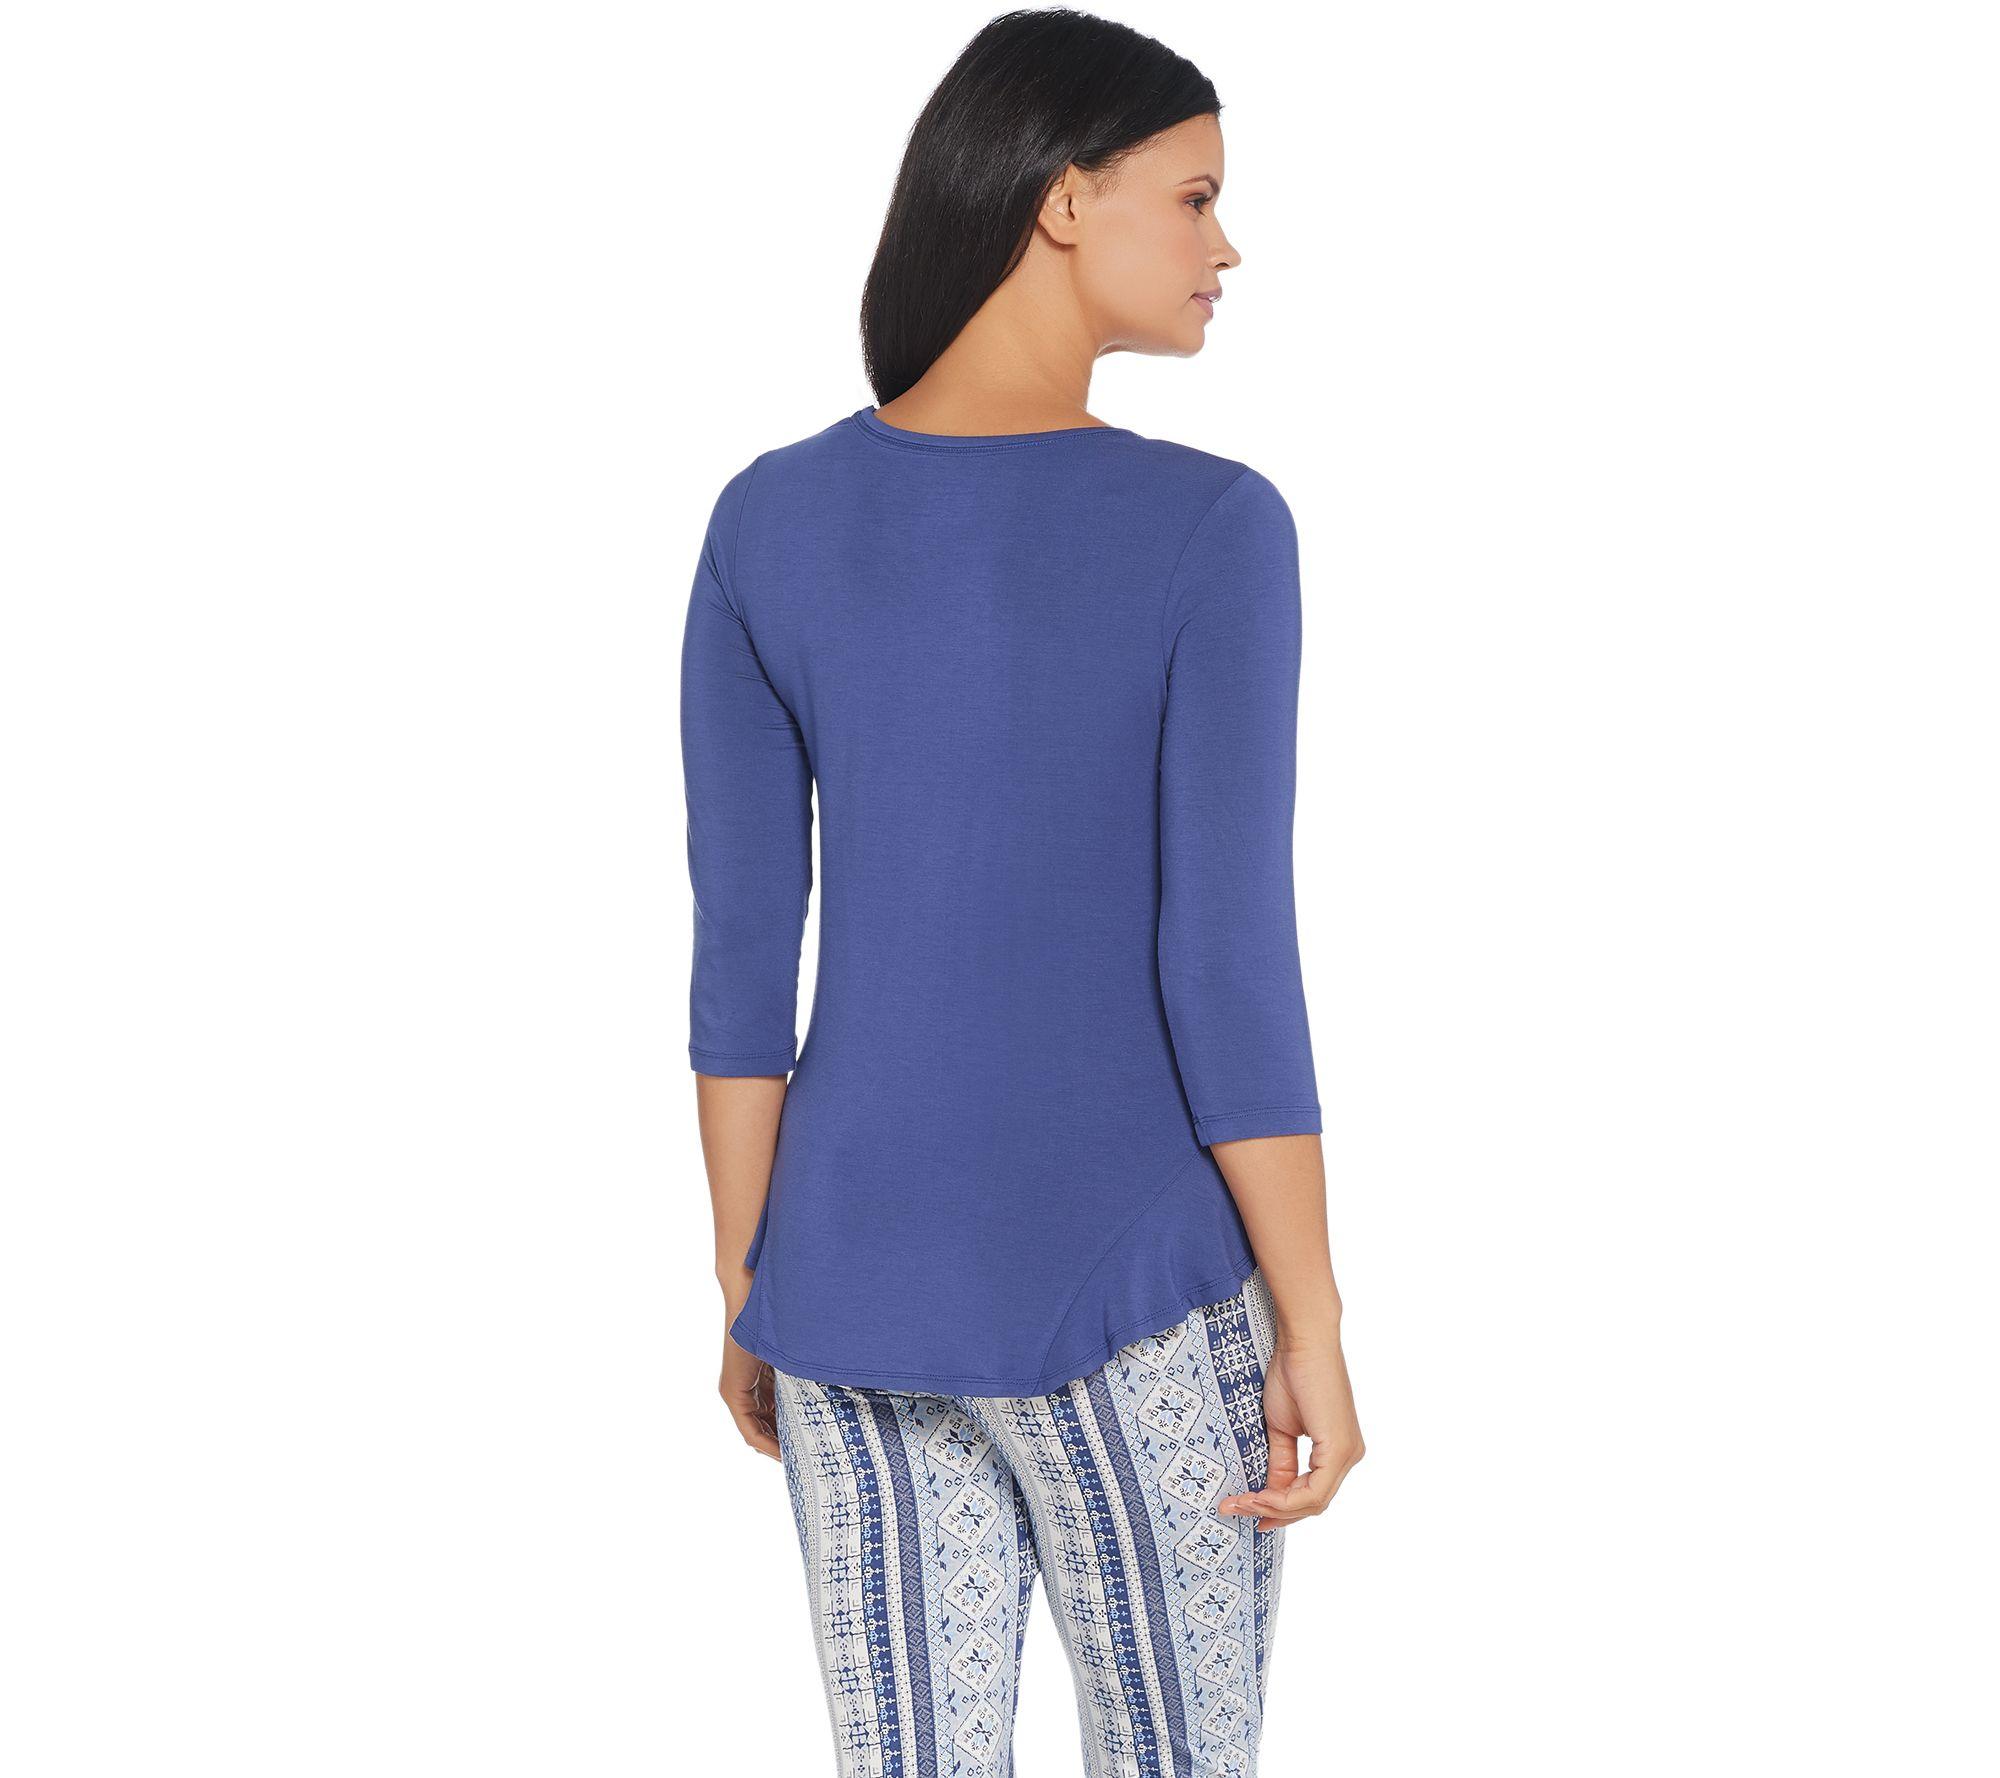 Cuddl Duds Softwear Stretch Novelty Jogger Pajama Set